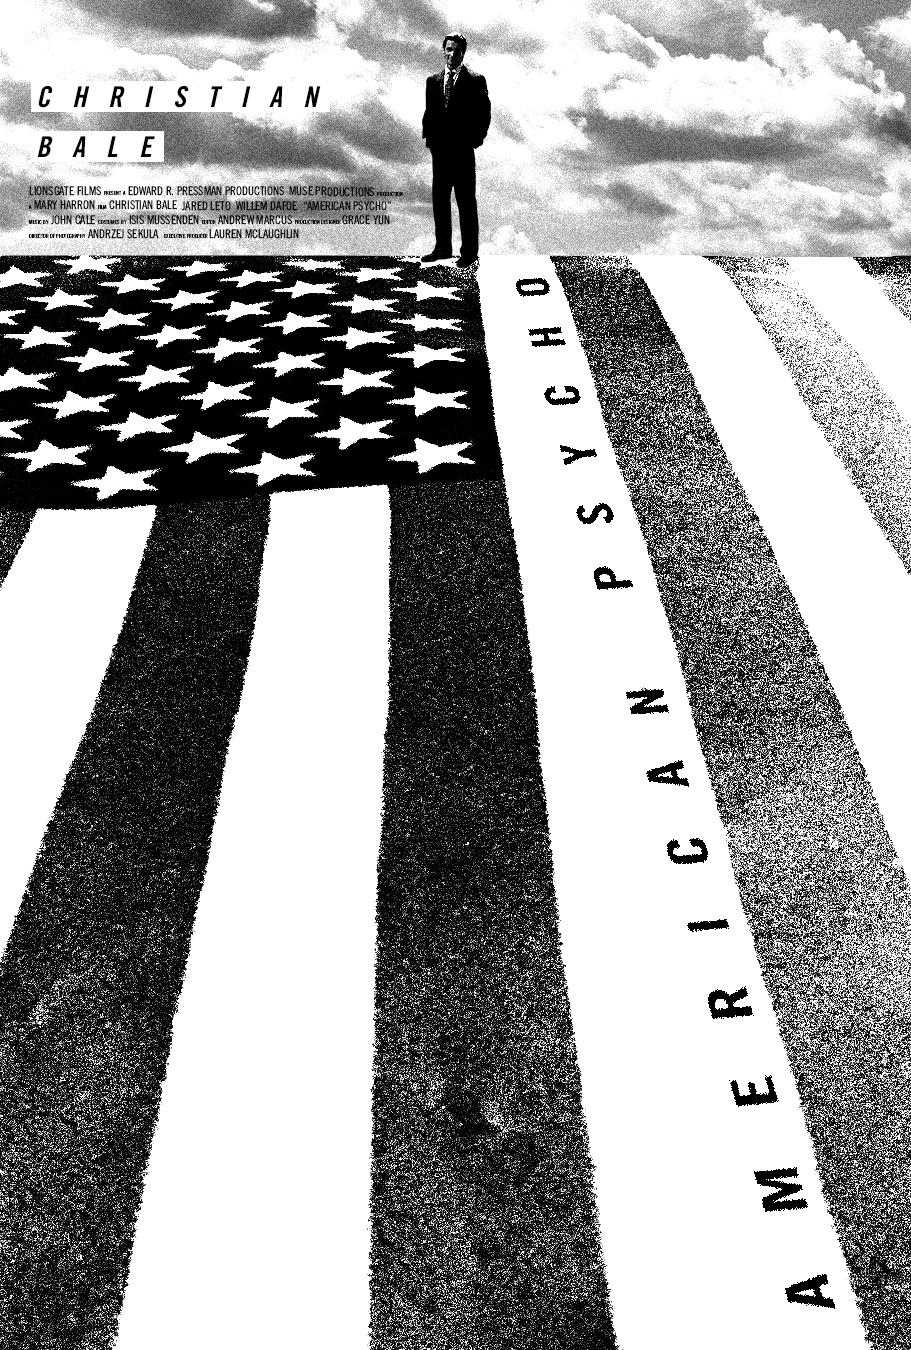 Digital Poster_AmericanPsycho.jpg